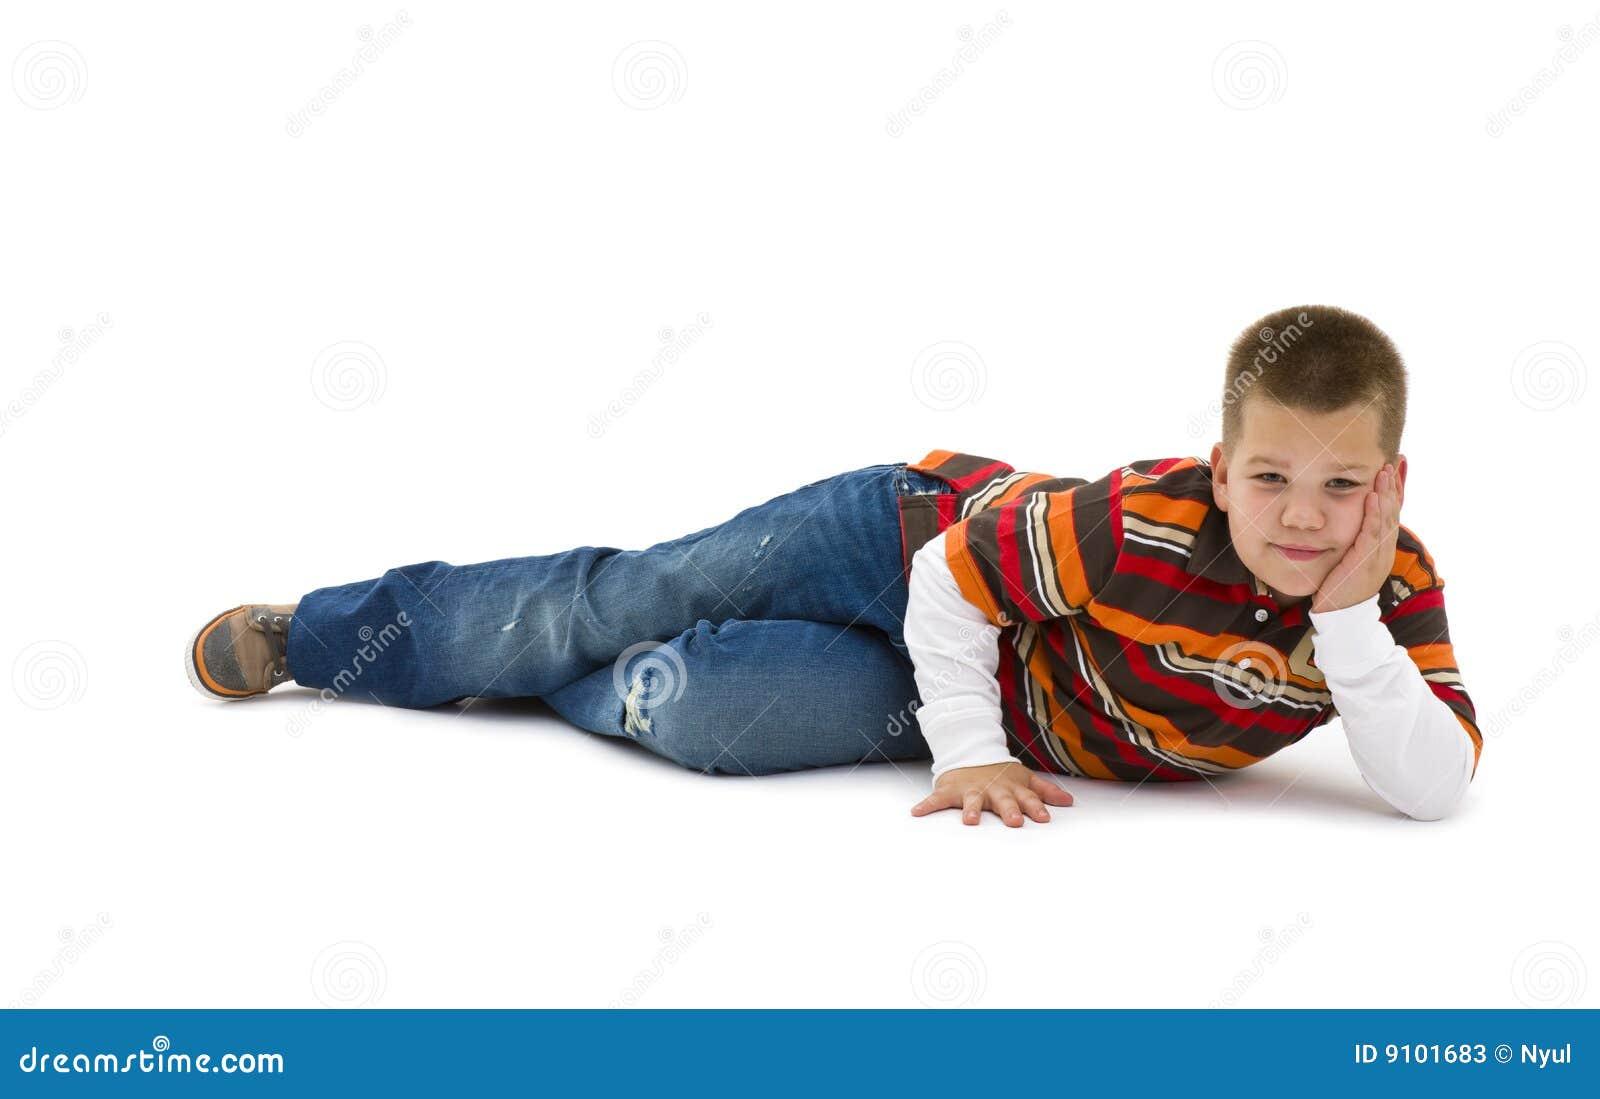 Boy lying on floor stock photos image 9101683 for On the floor